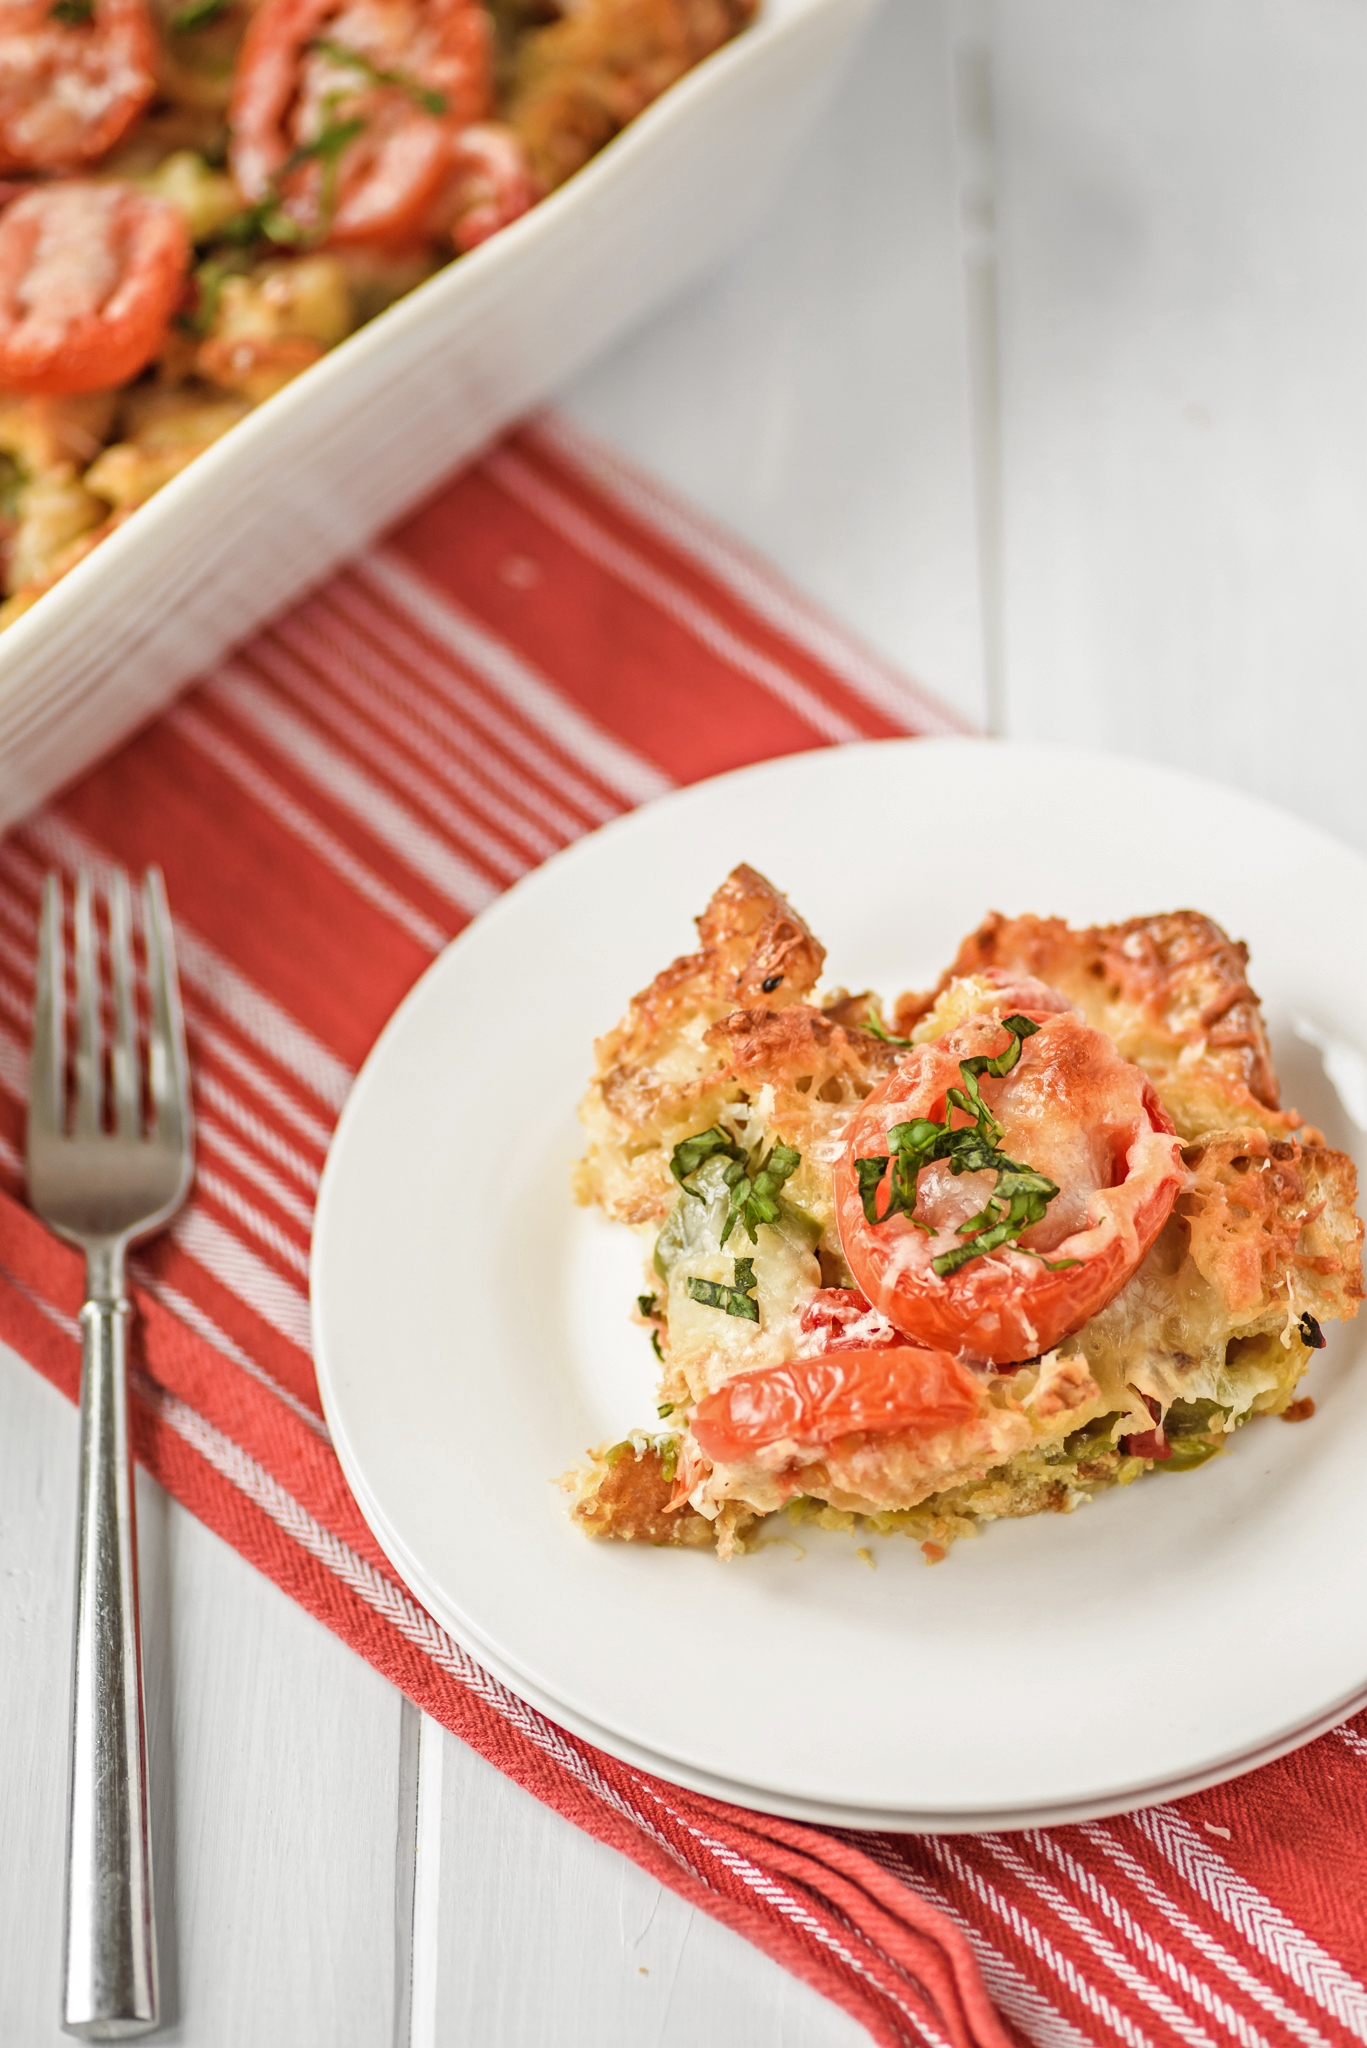 Tomato Mozzarella Parmesan Bake